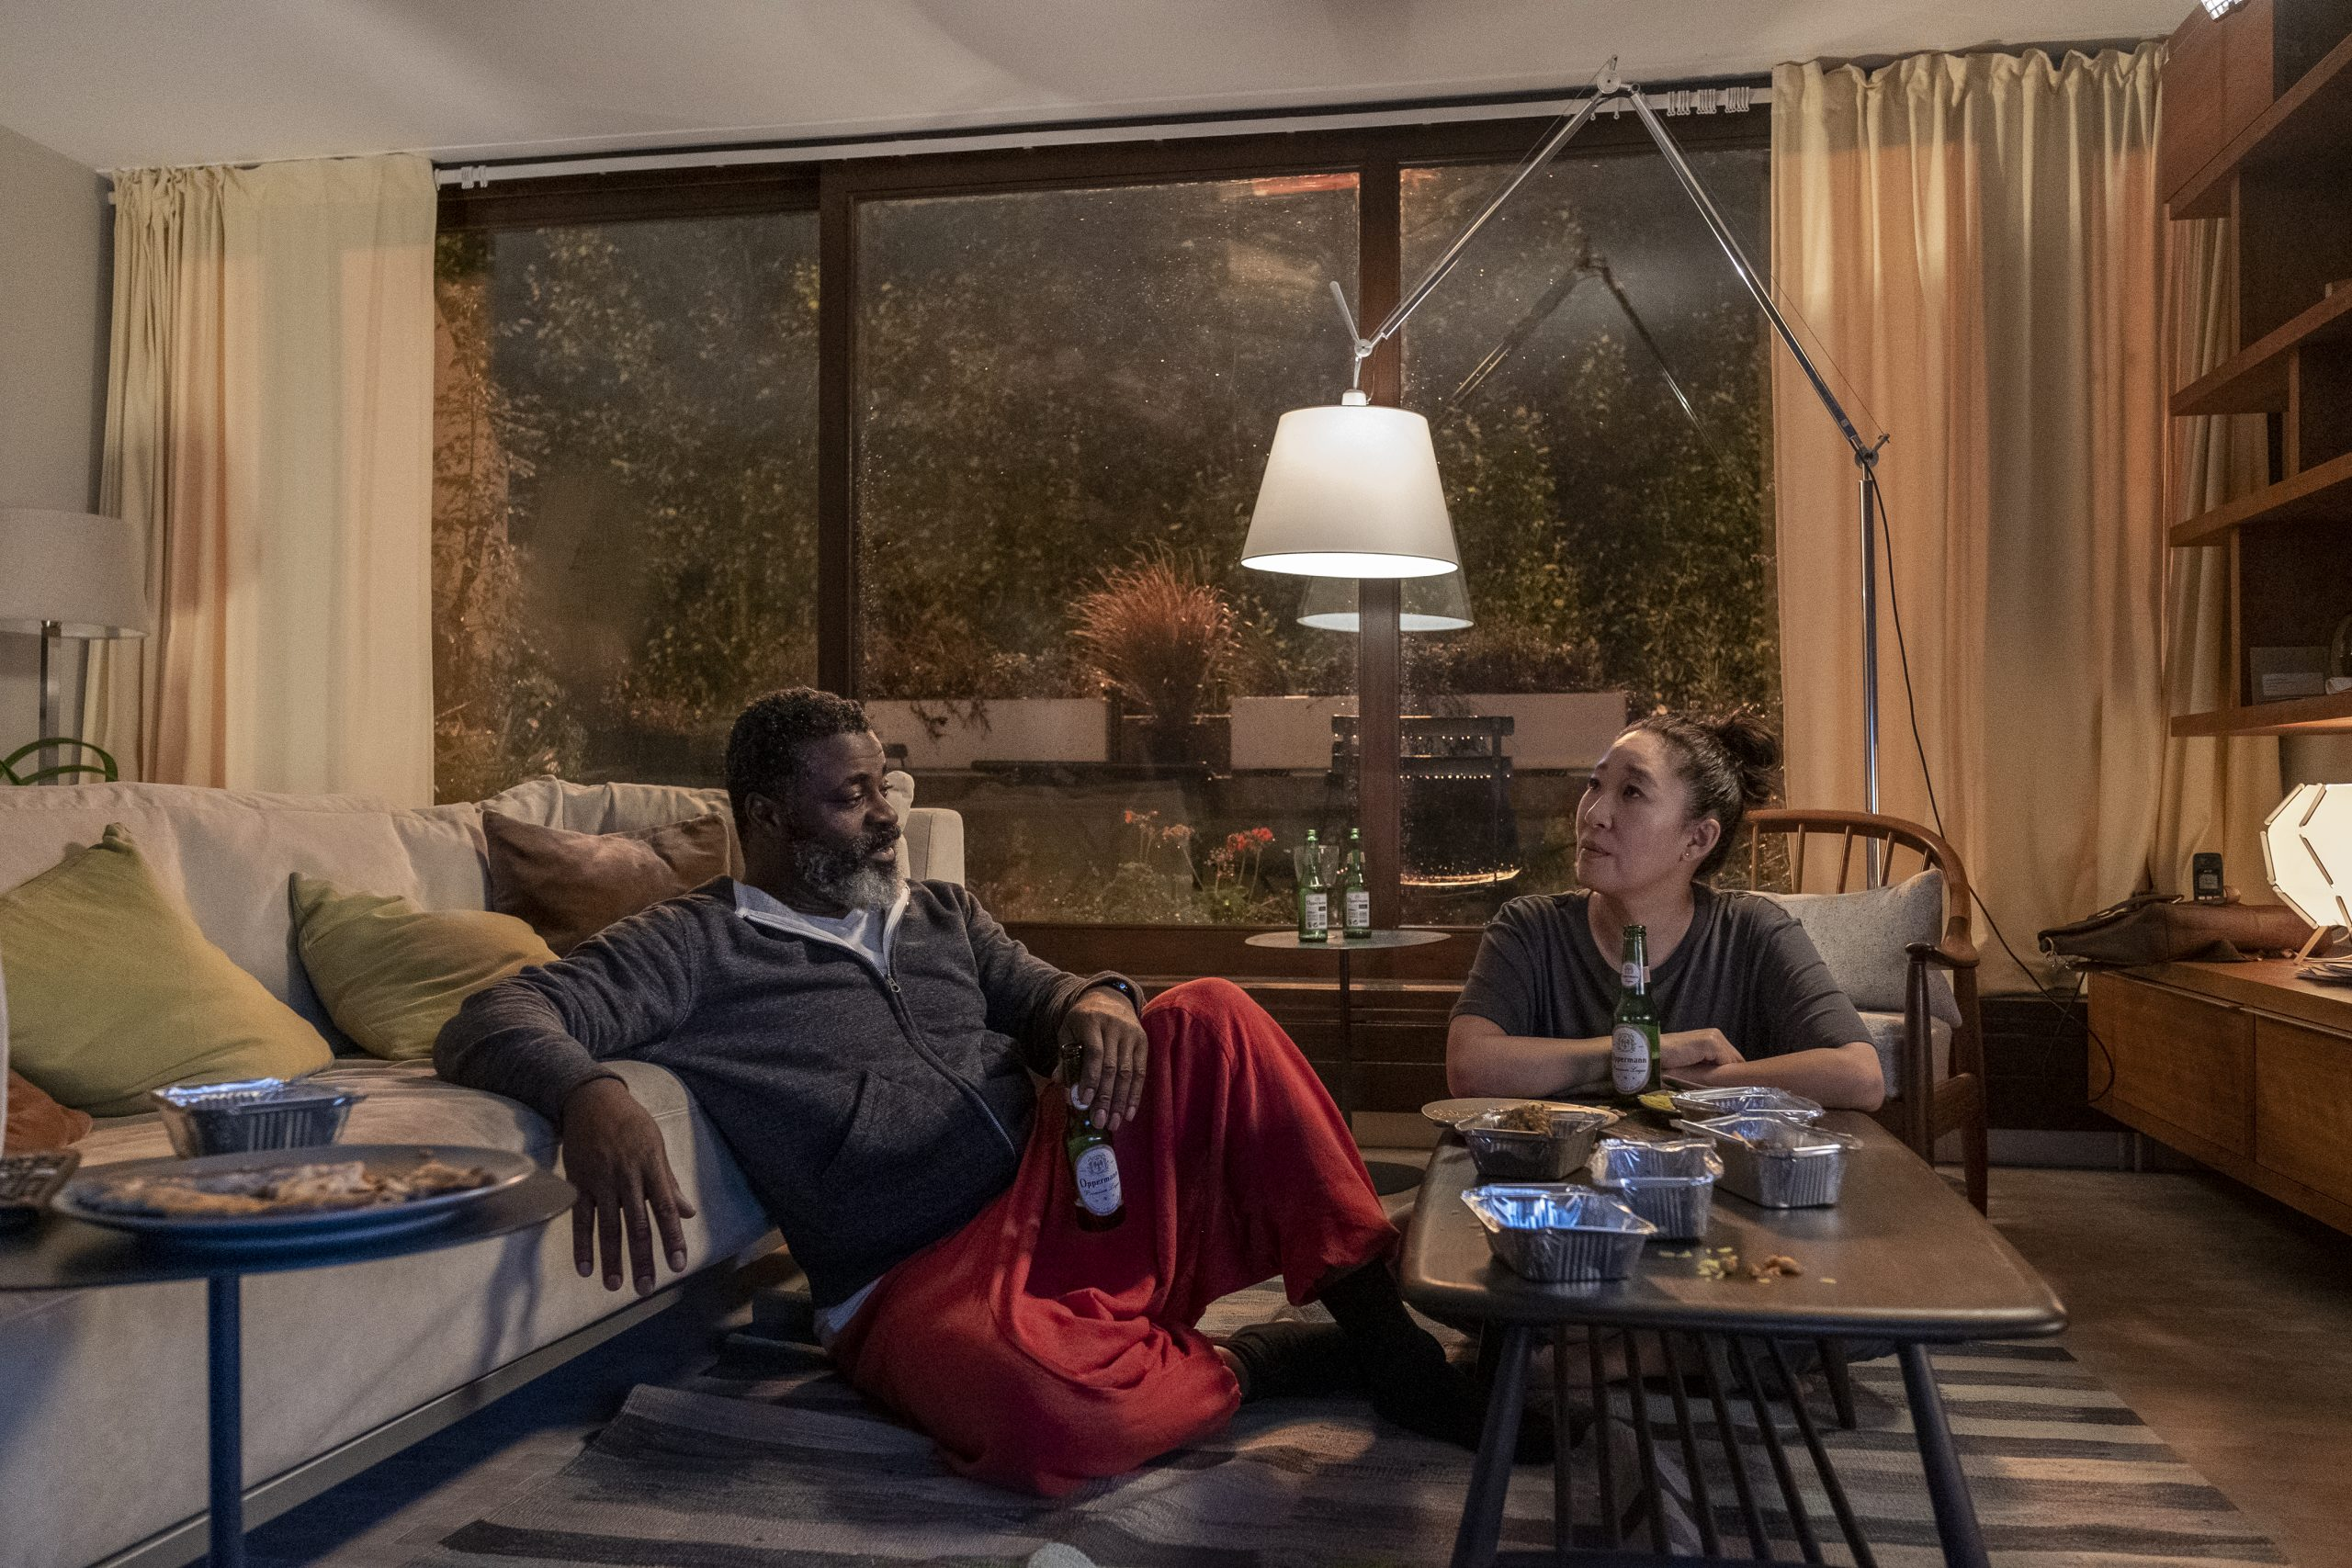 Killing Eve Season 3 Episode 4 Recap: 'Still Got It'